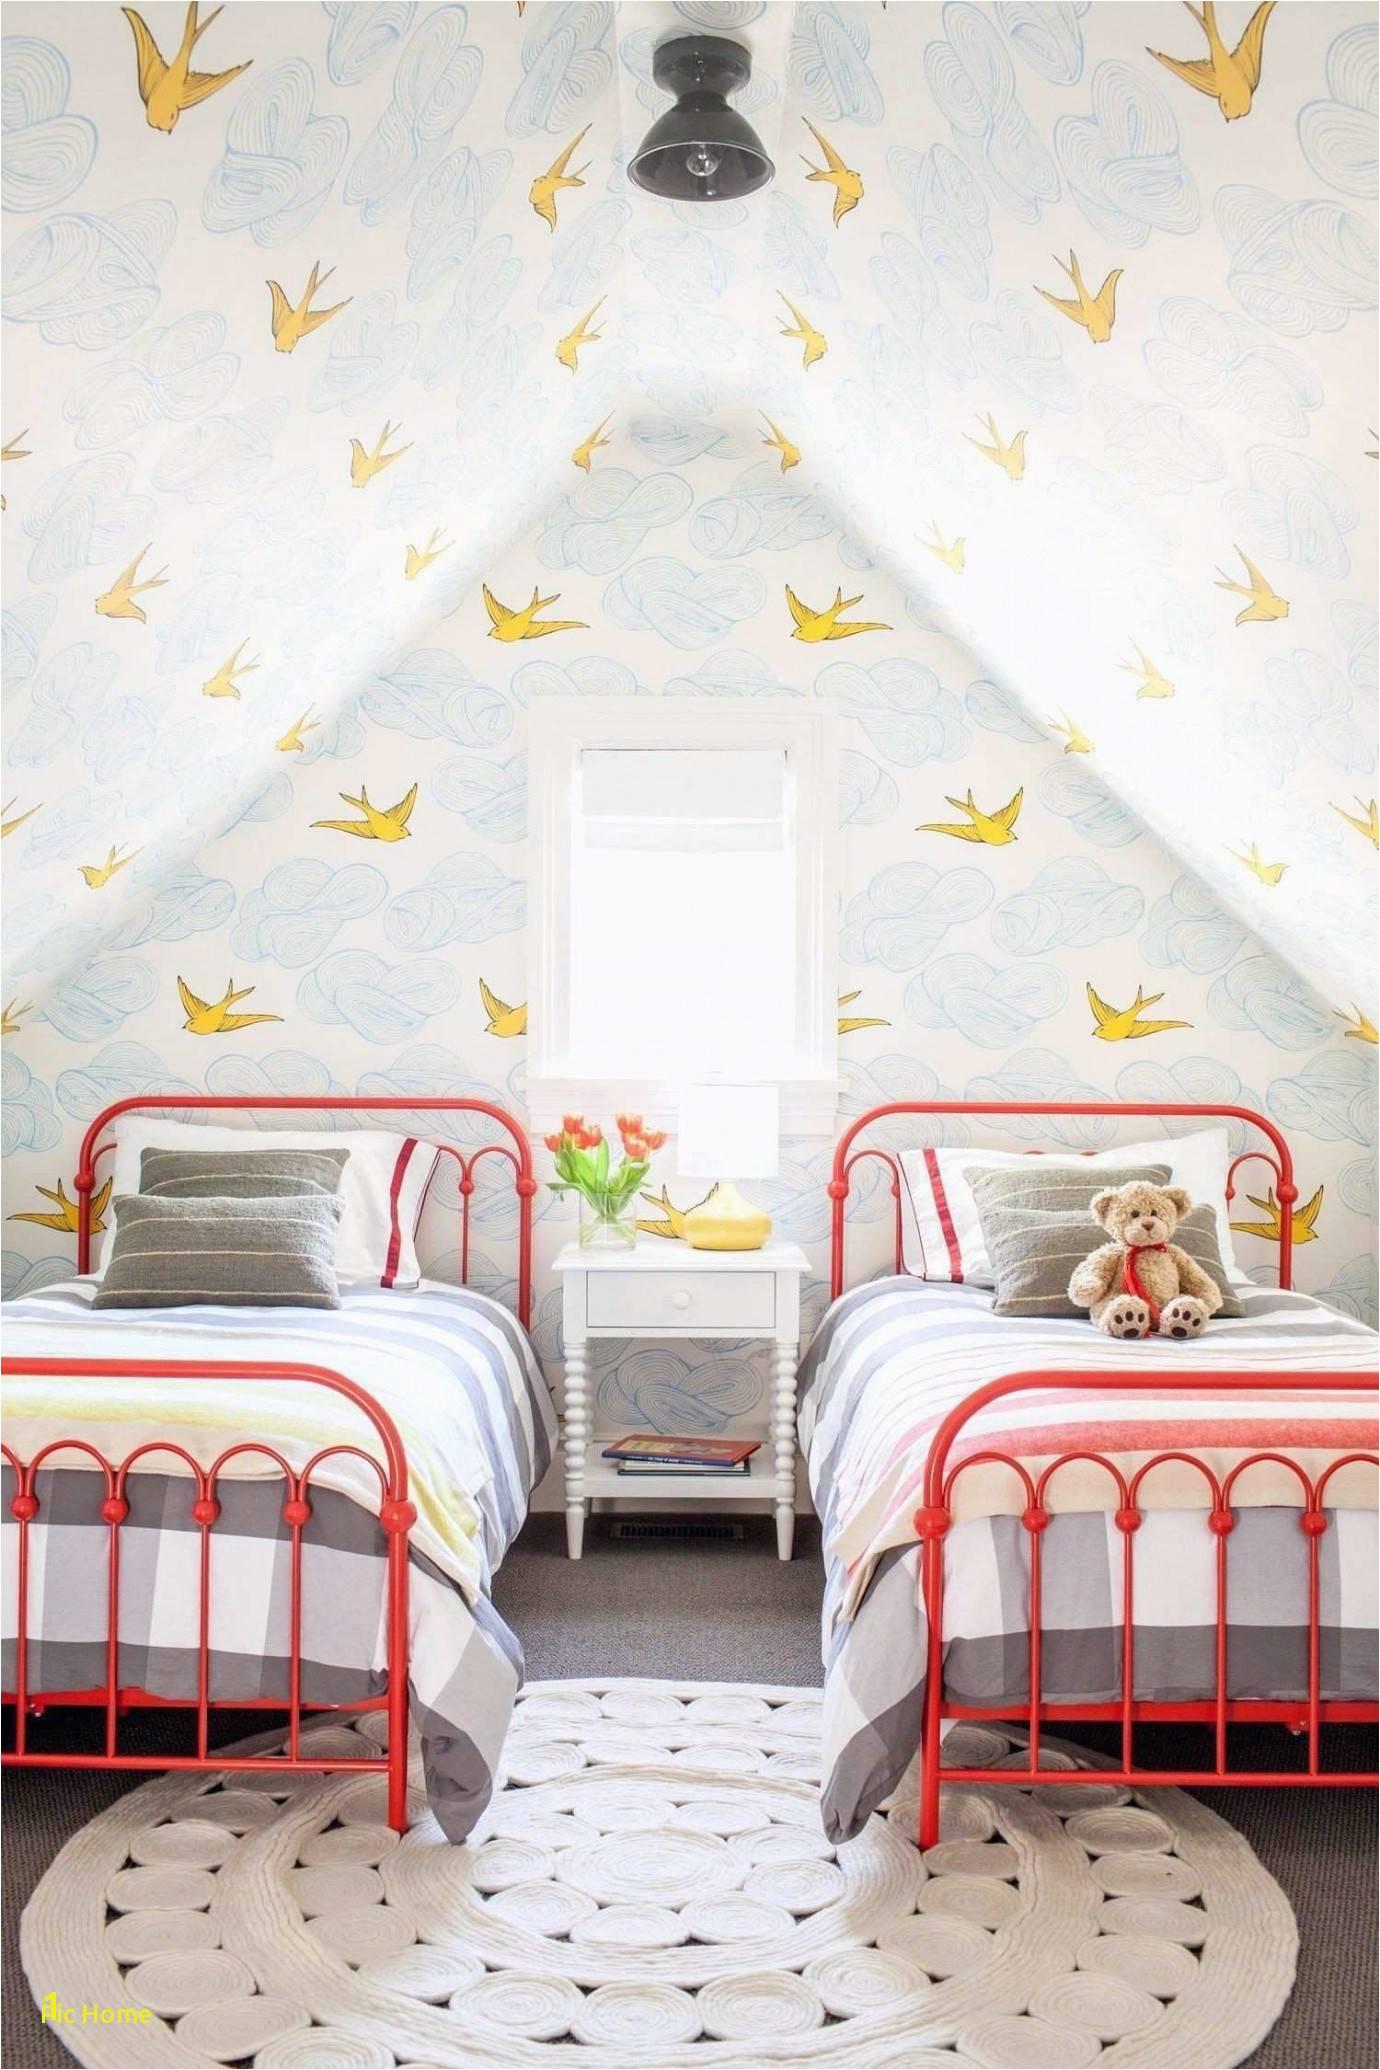 Little Girl Bedroom Wall Murals Fresh Little Girl Bedroom Wall Murals